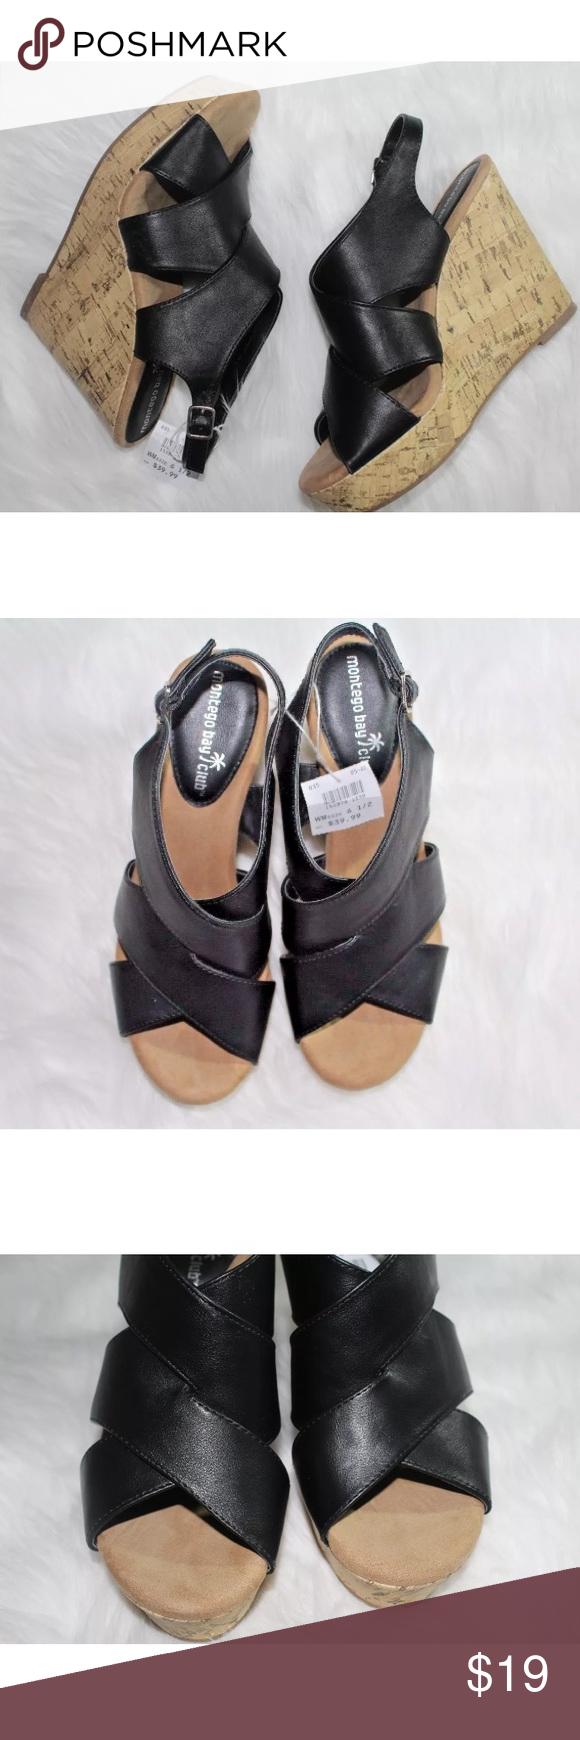 Black wedge sandals 2 inch heel - Montego Bay Club Womens Black Slides Wedges Montego Bay Club Womens Black Slides Platform Wedge Sandals